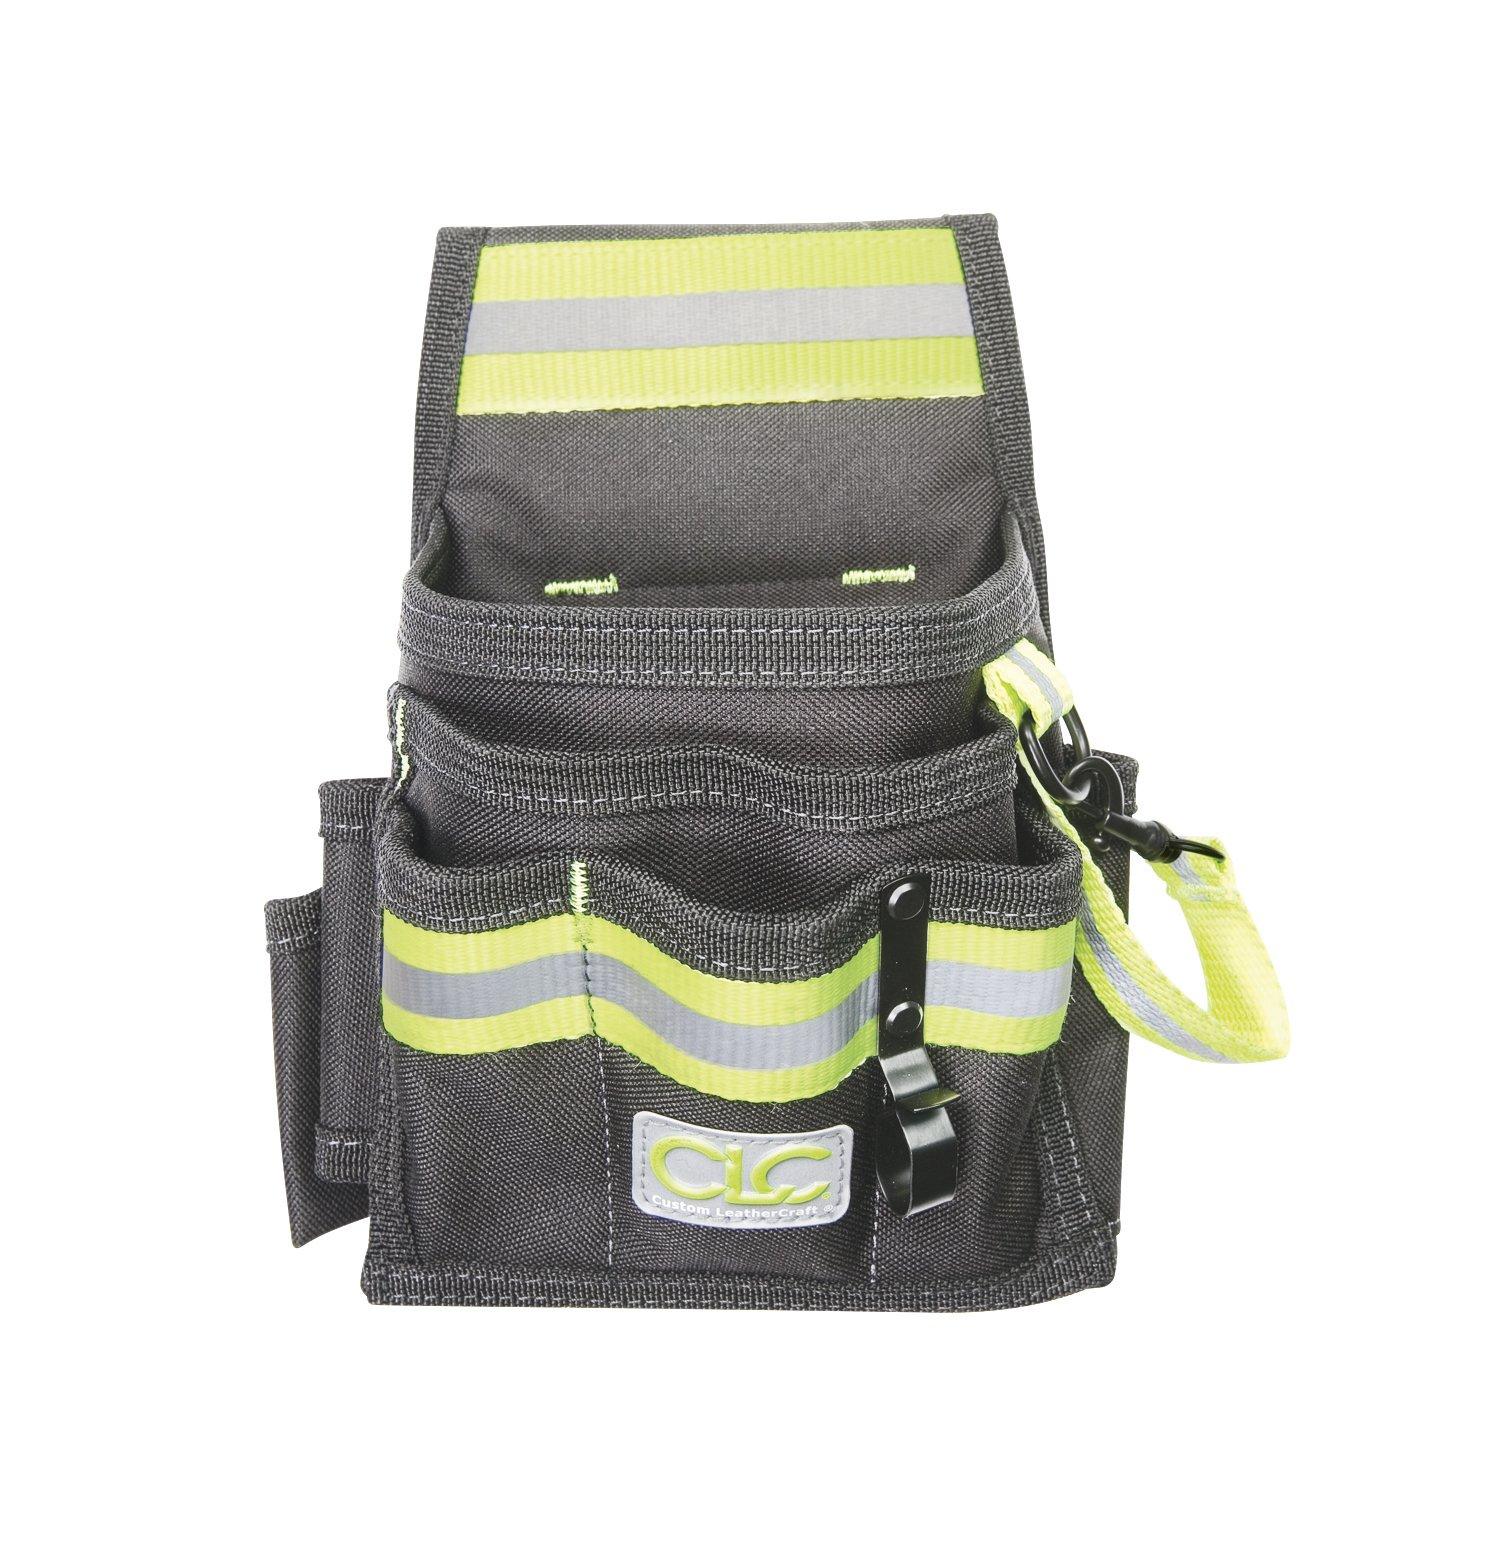 Custom Leathercraft 141503 Hi-Viz 9-Pocket Electrical & Maintenance Pouch